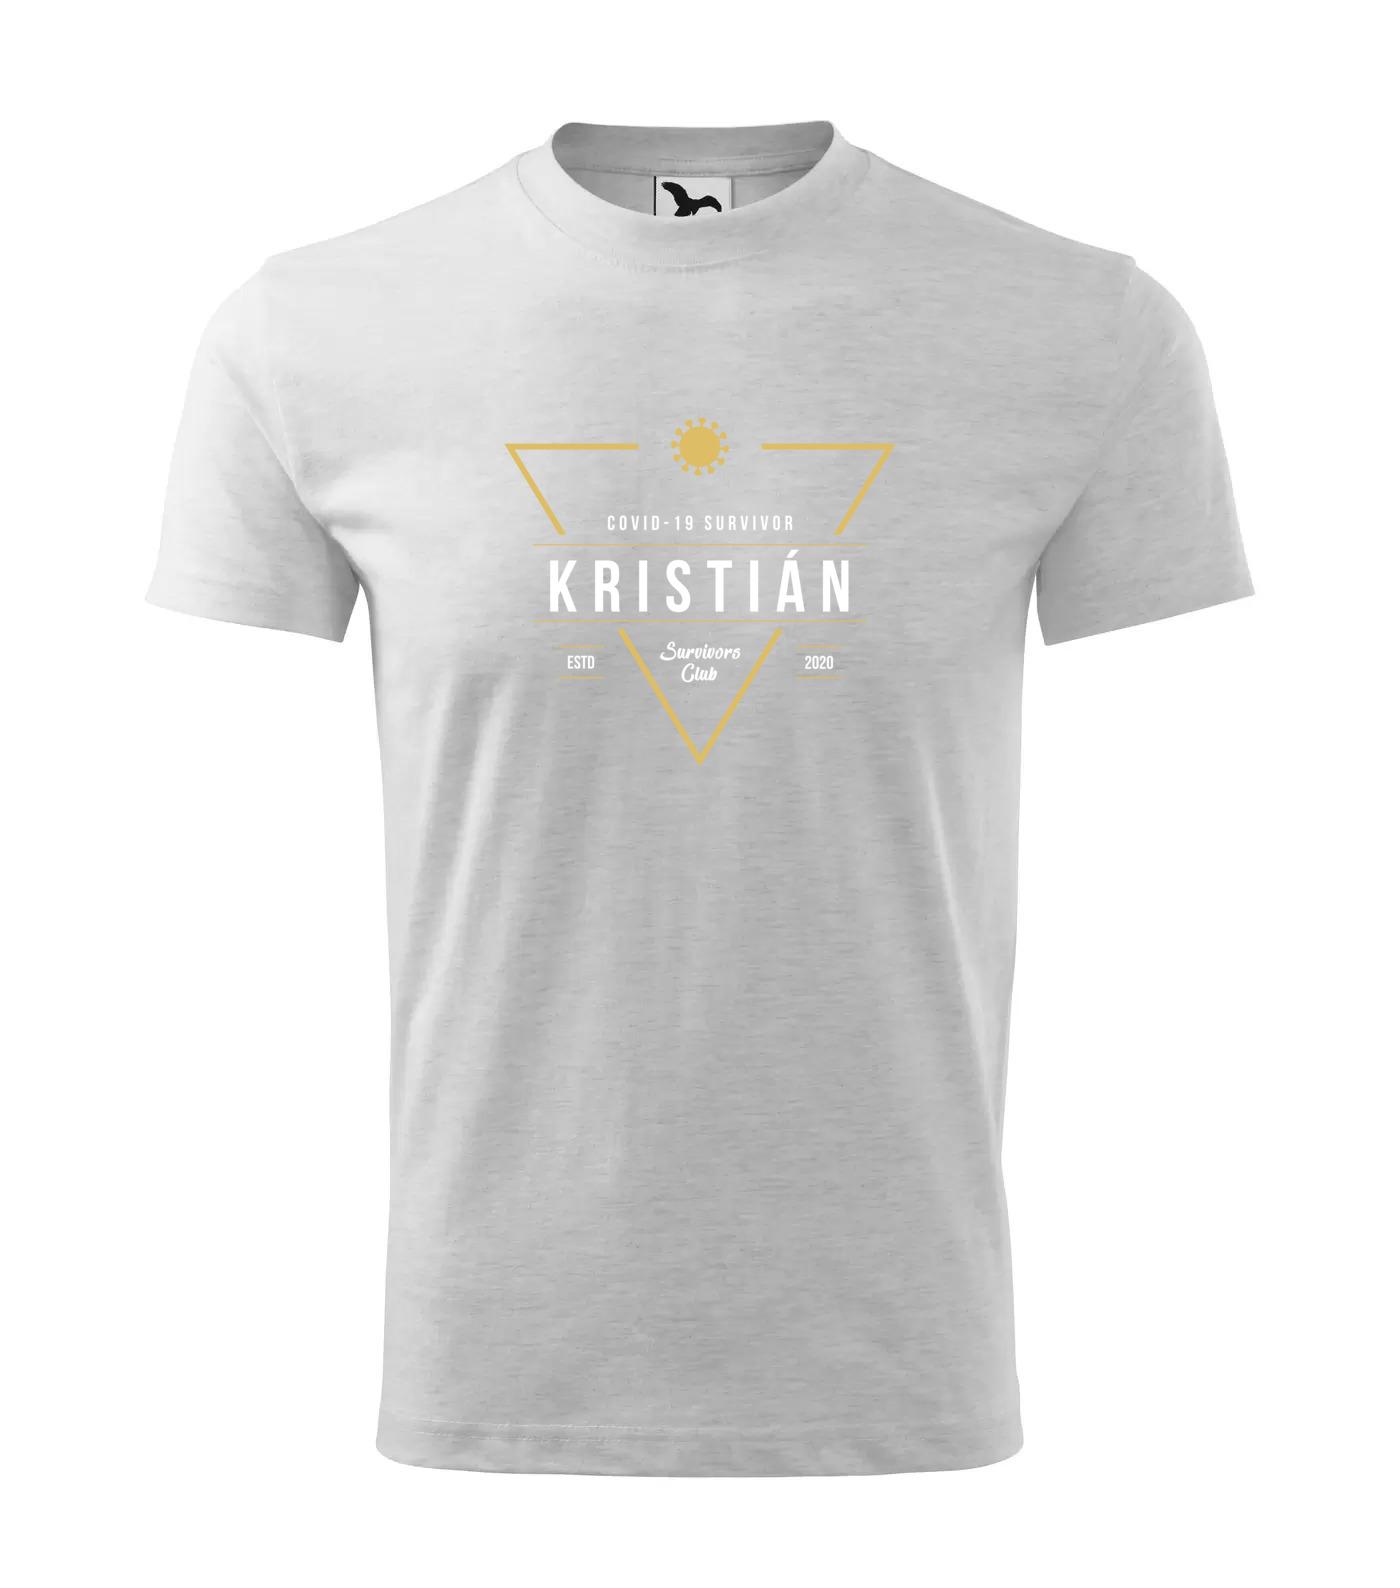 Tričko Survivor Club Kristián